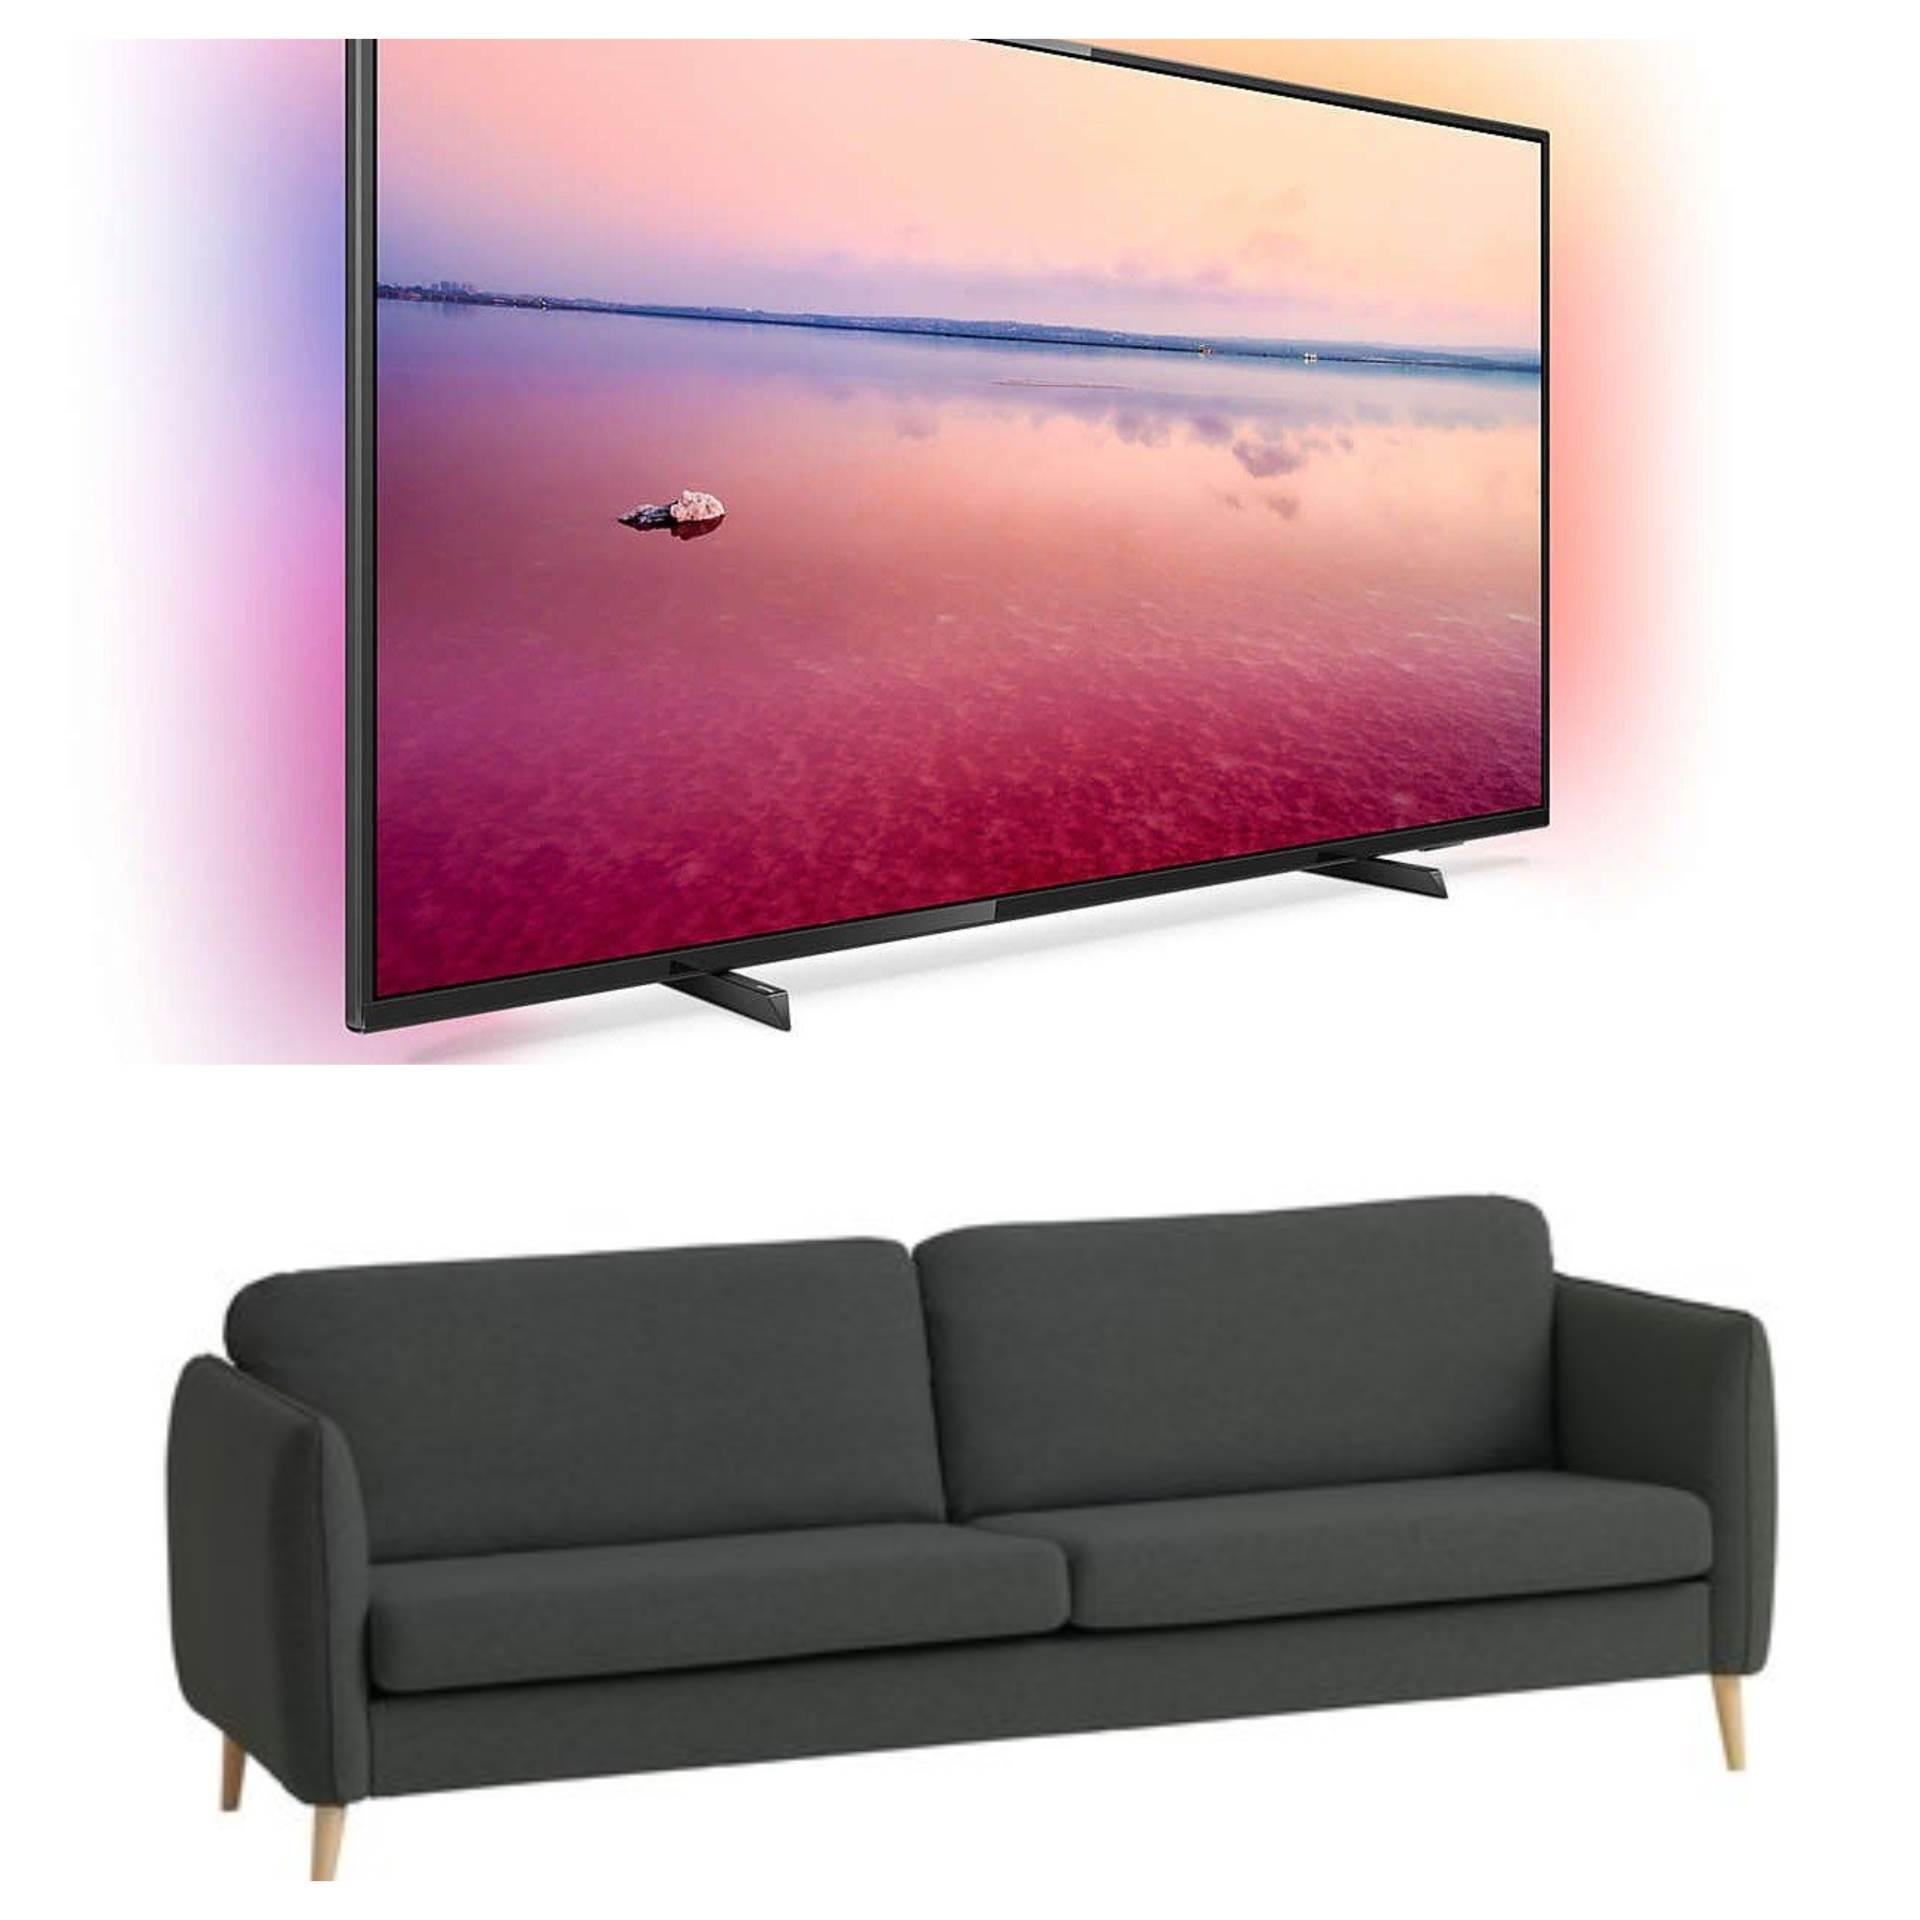 LED TV Philips 55PUS7805, SMART, Ambilight, Santa Domenica, 4699 kn; Trosjed Aarhus, Jysk , 2750 kn (sve Arena Centar i Arena Park)